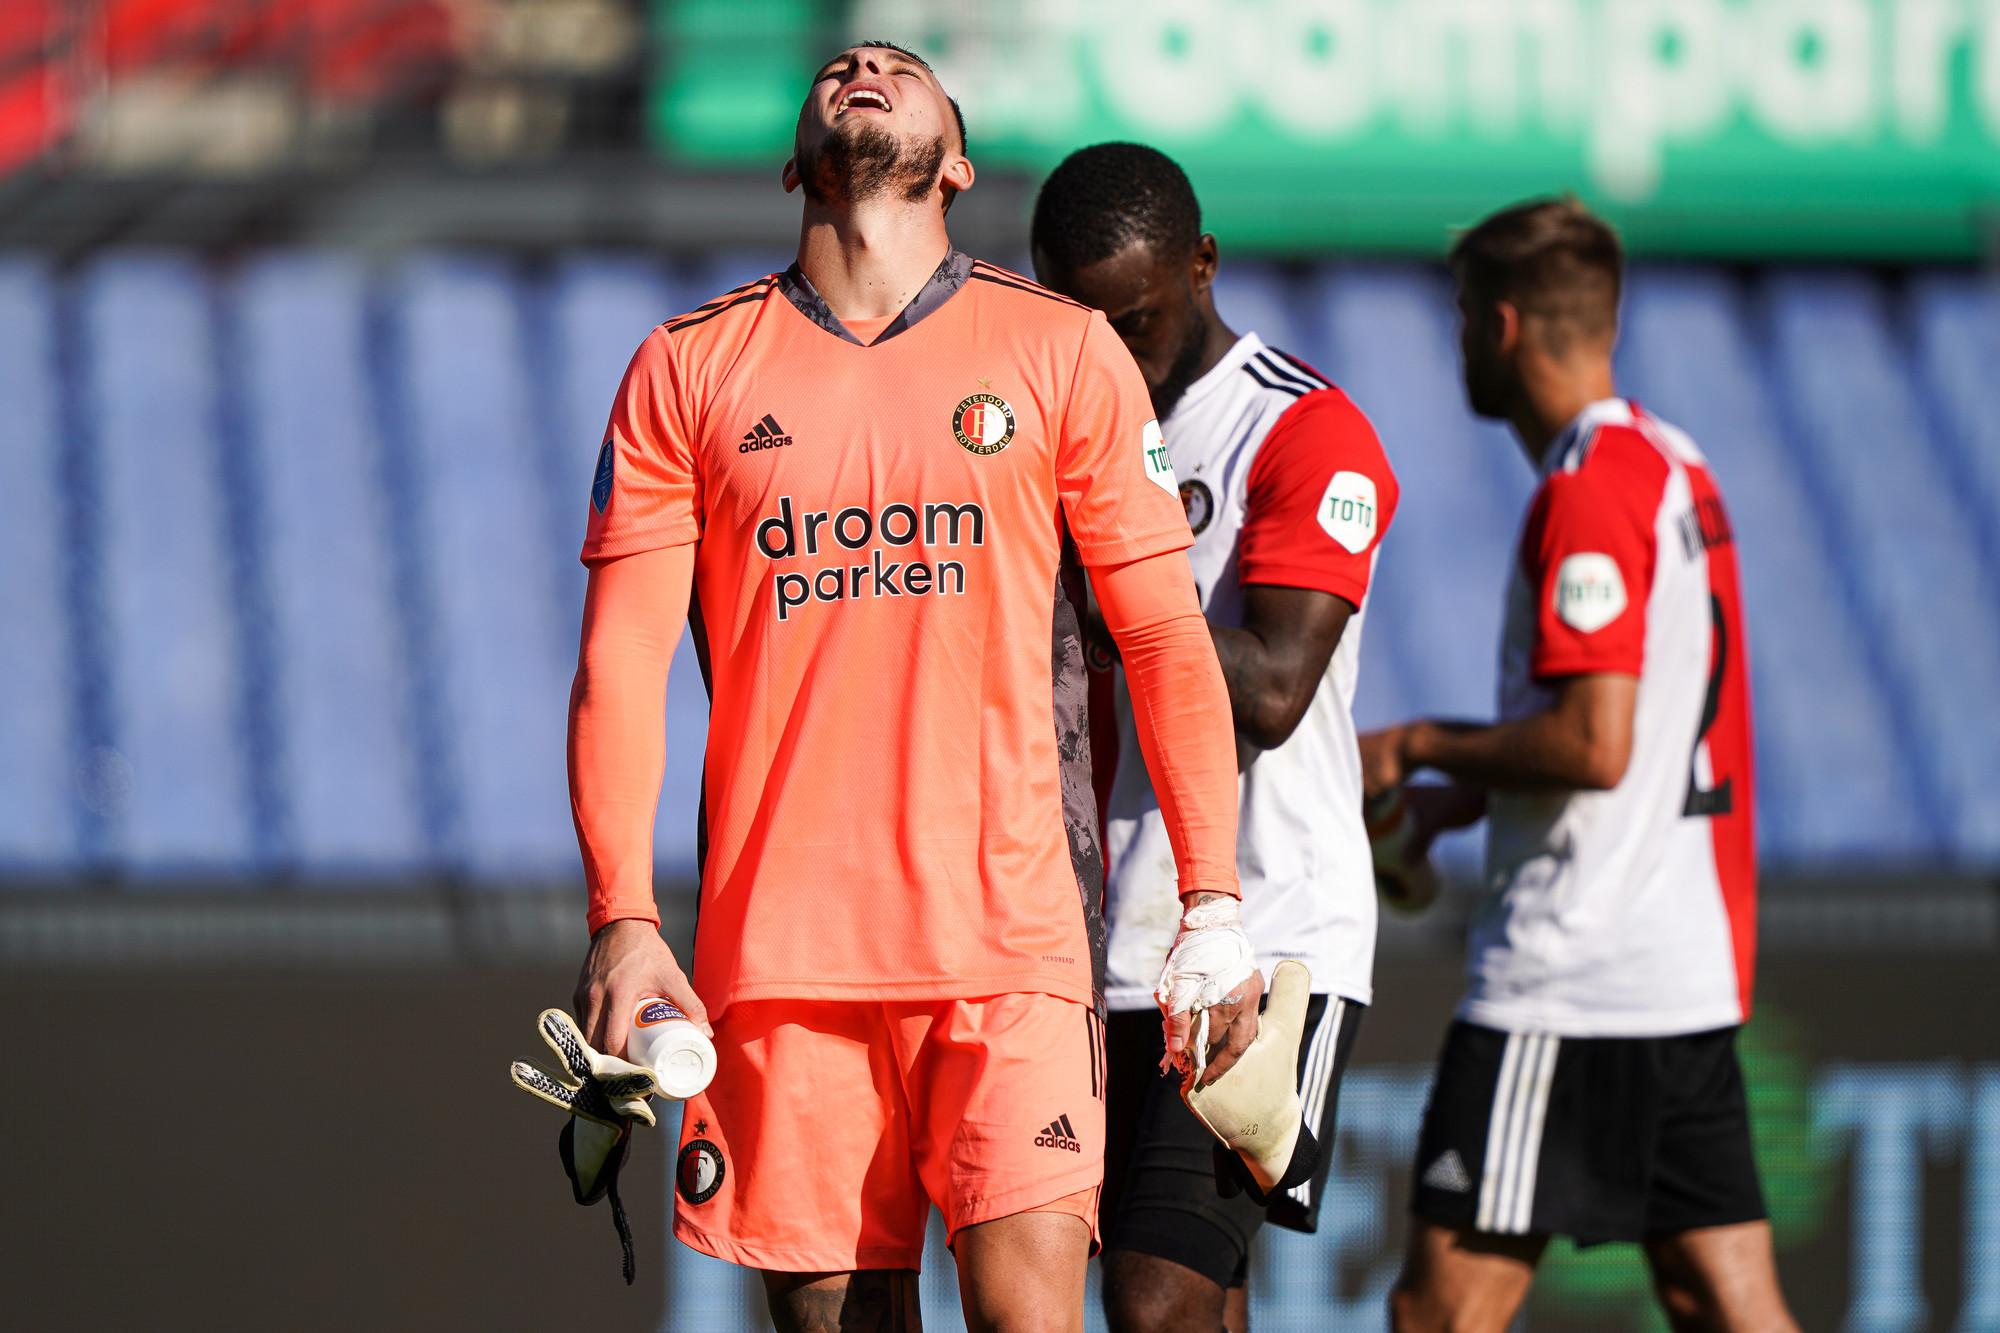 Feyenoord对FC Twente的跌倒点